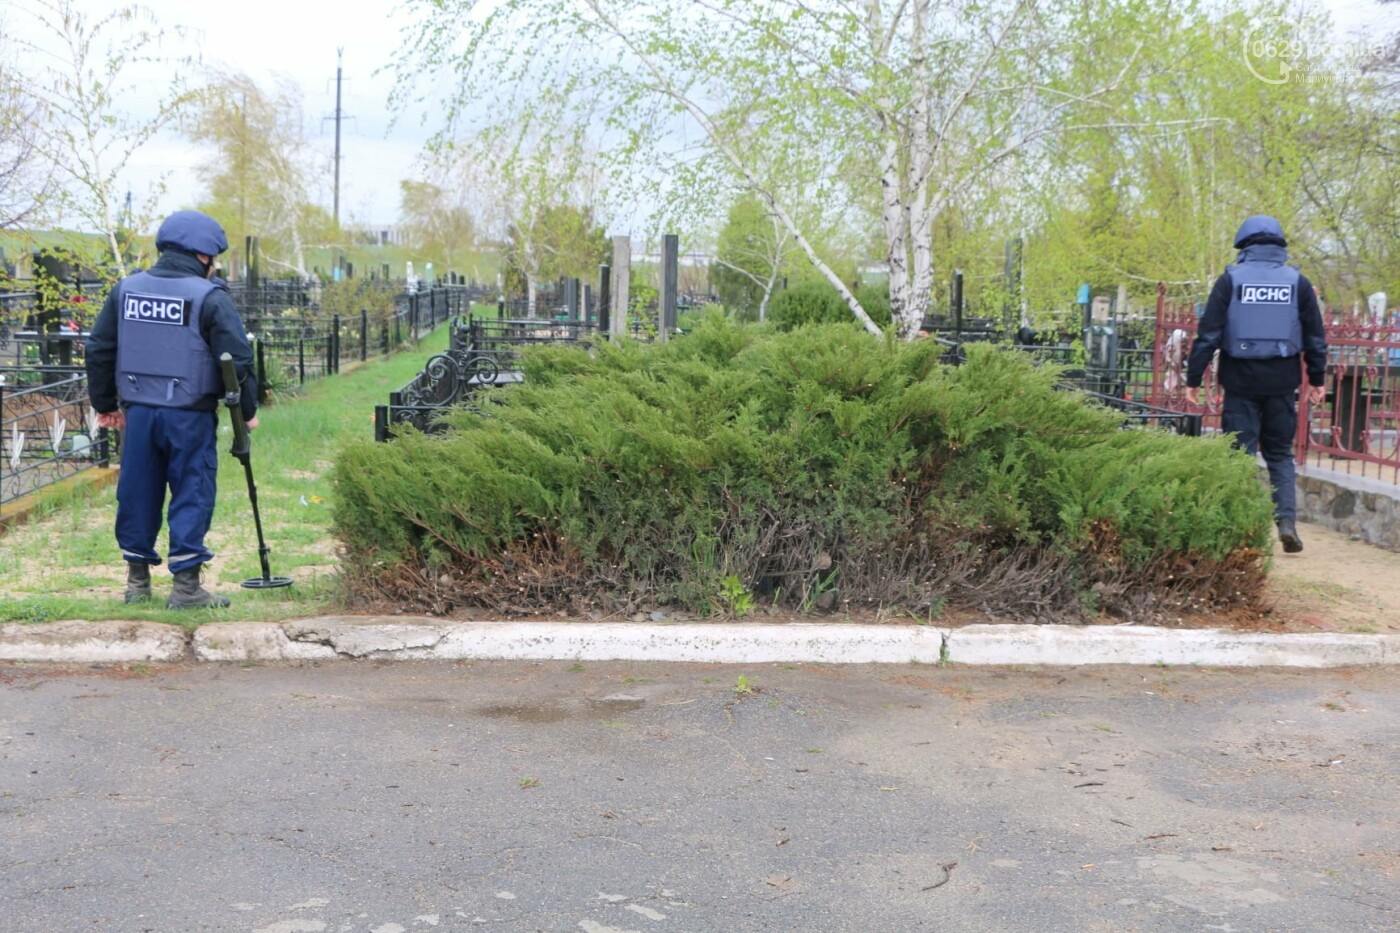 Пиротехники начали проверять безопасность кладбищ Мариуполя,- ФОТО, ВИДЕО, фото-4